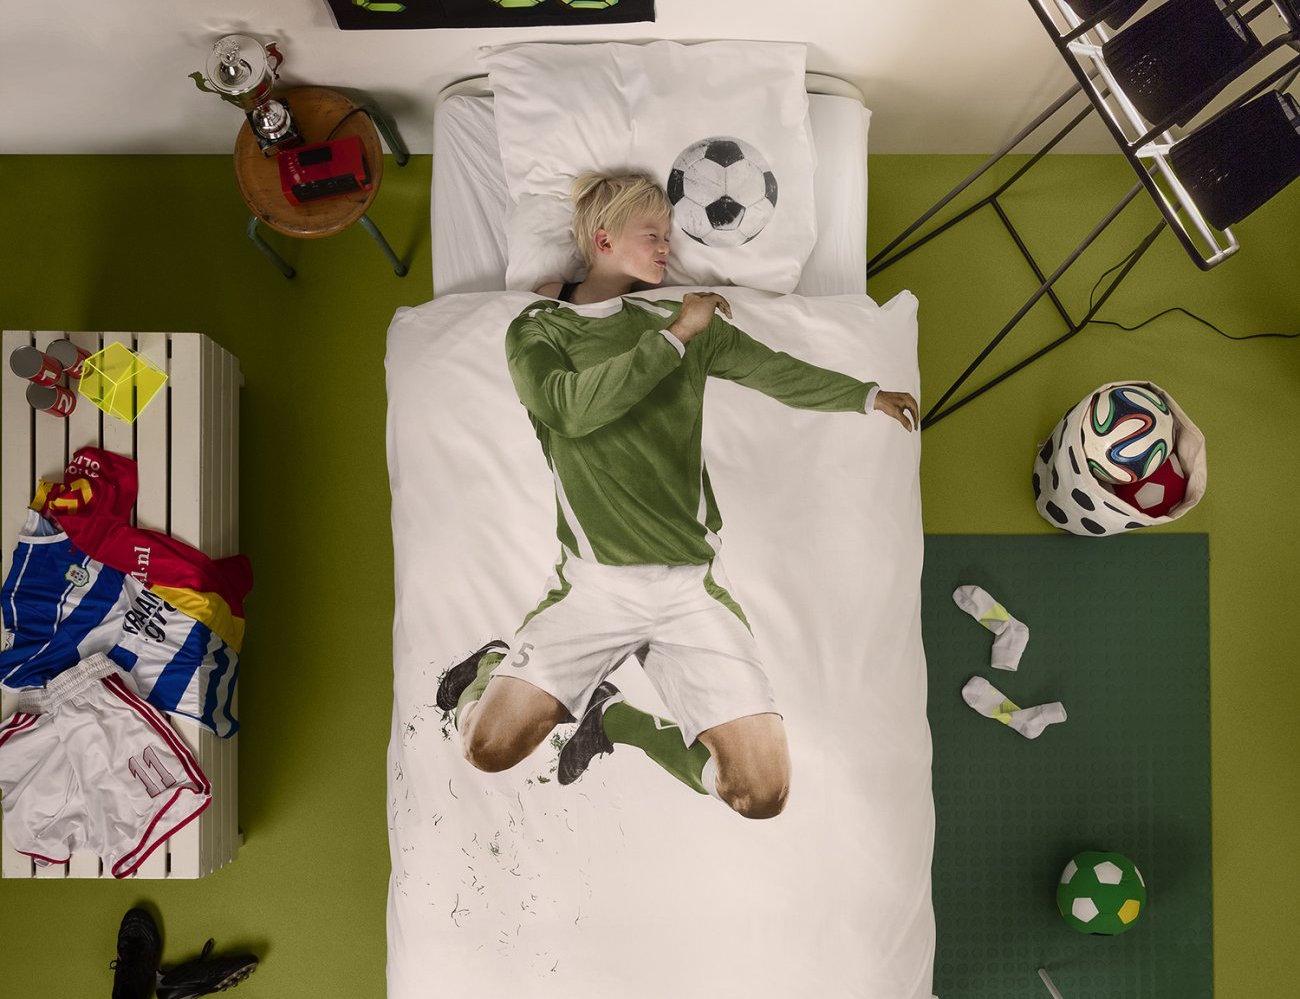 Soccer+Champ+Duvet+Cover+By+Snurk